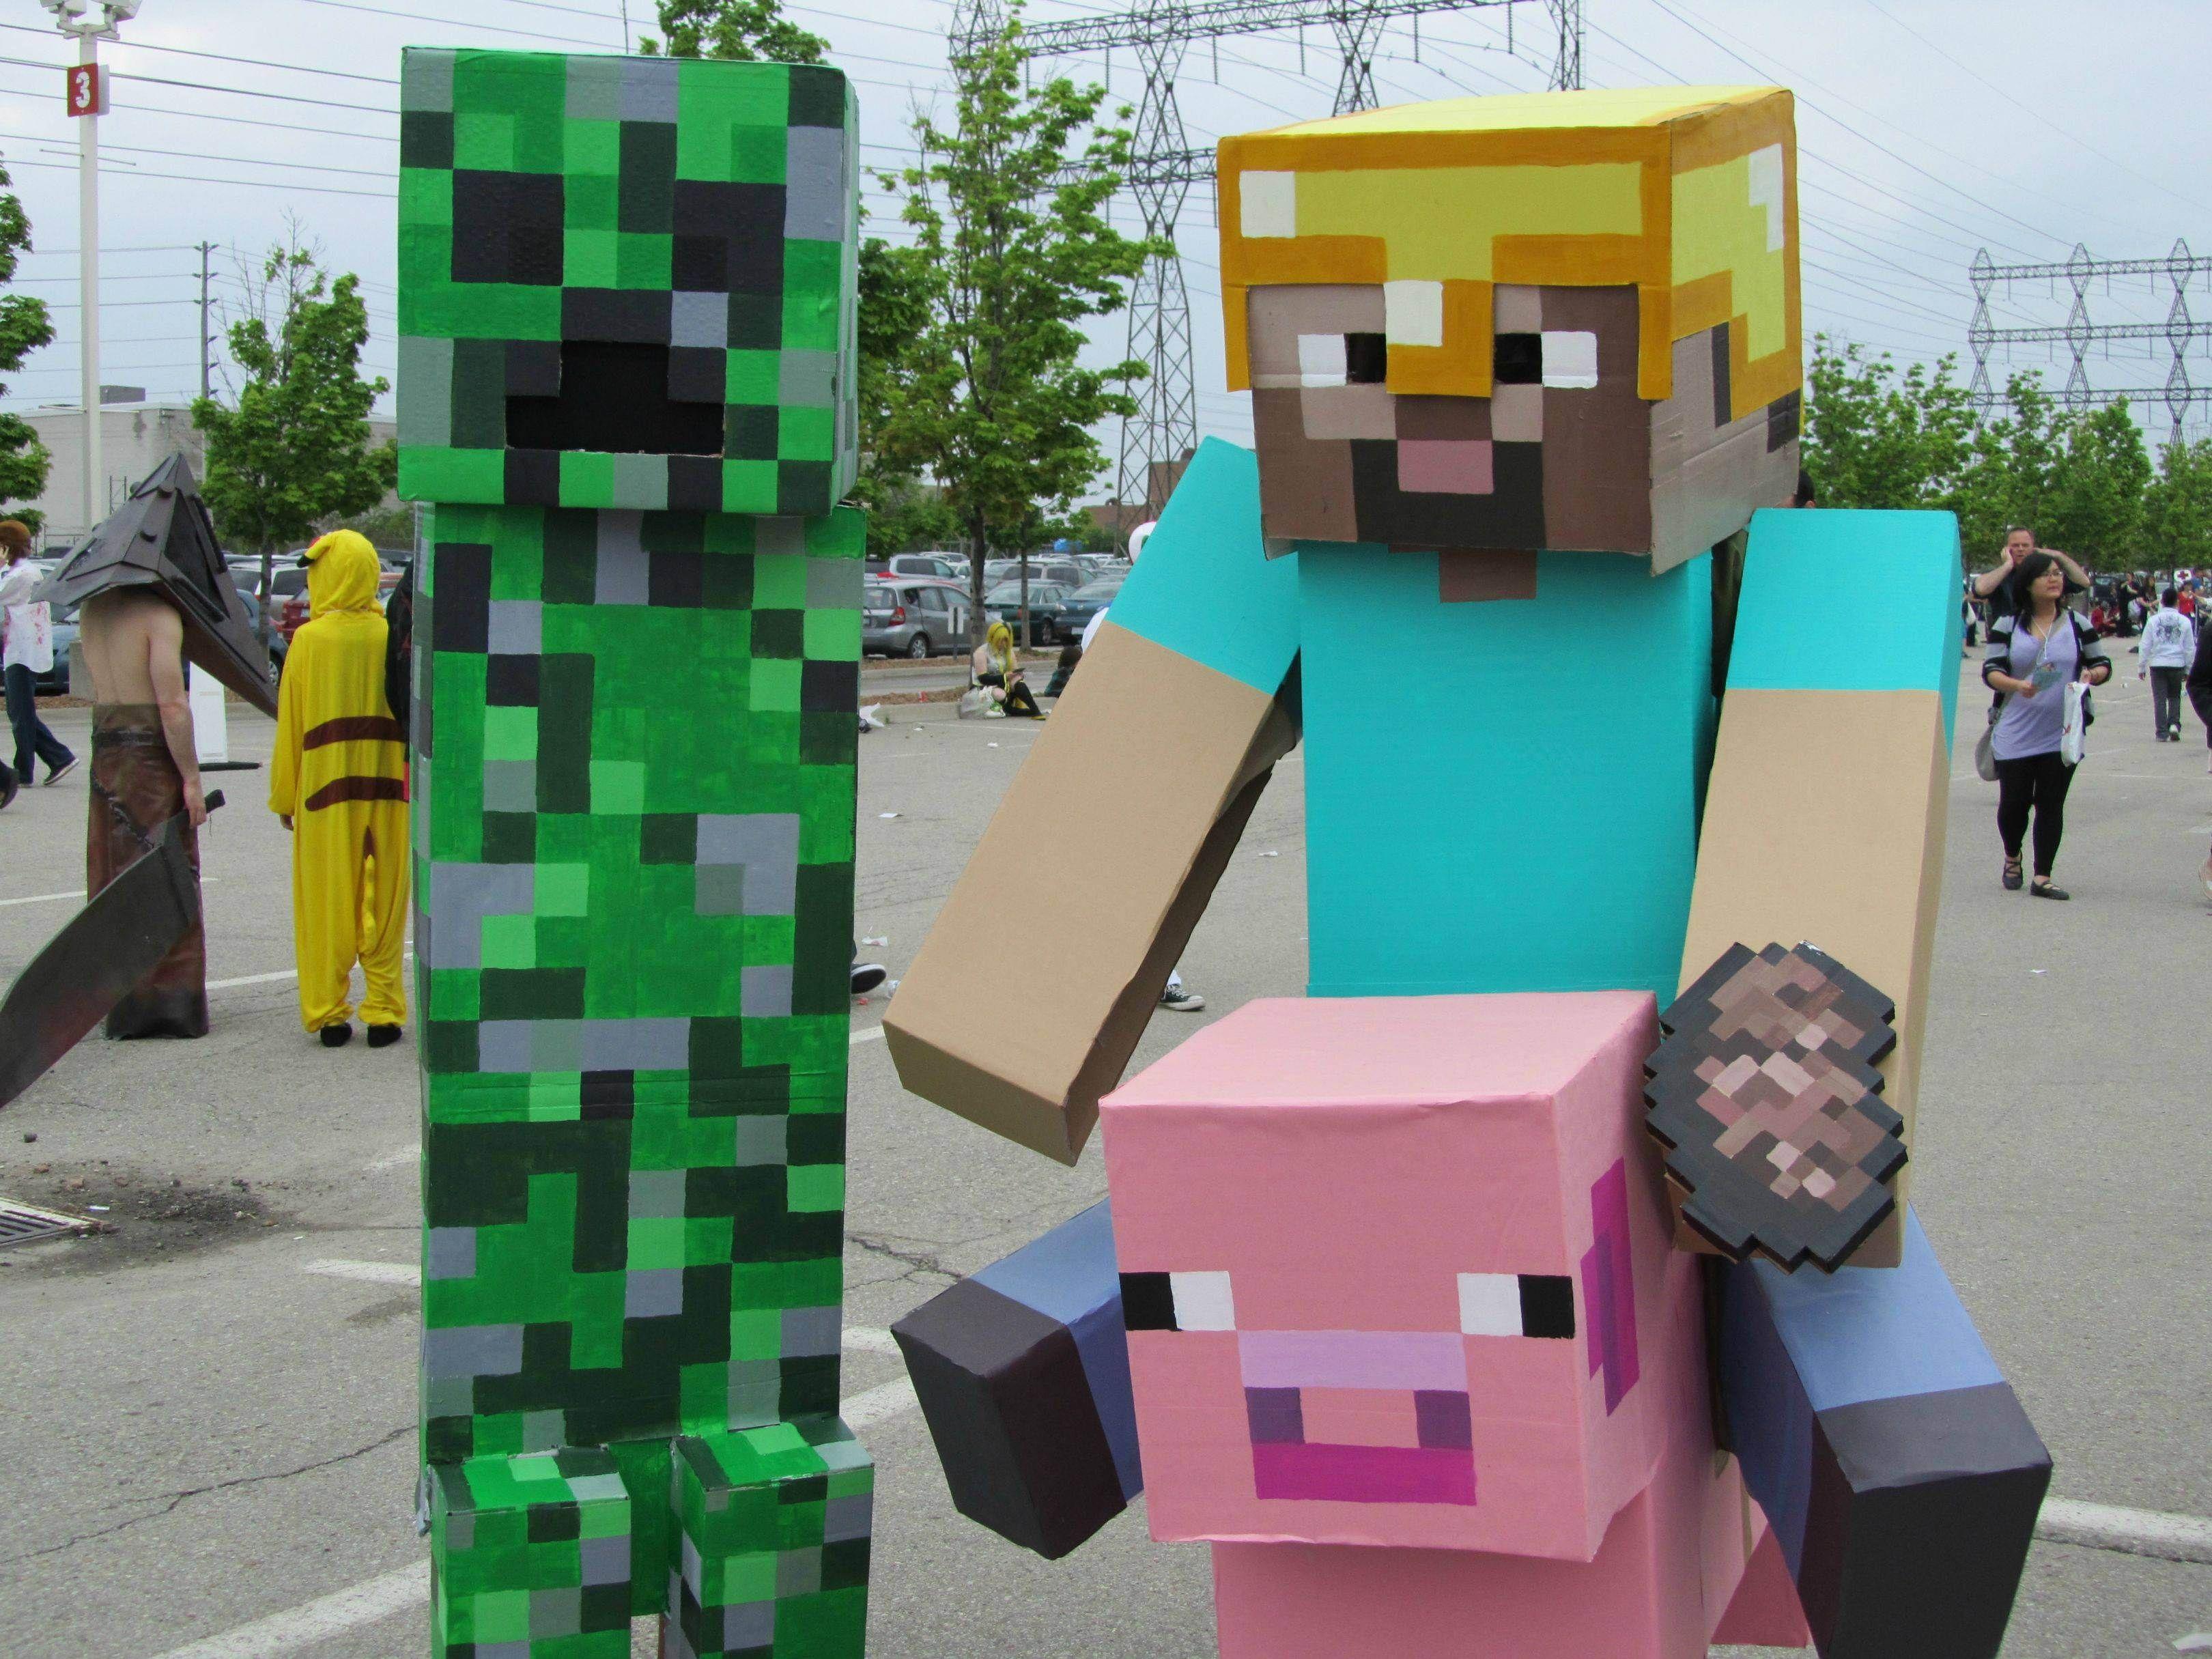 minecraft costume - google search | minecraft costumes | pinterest